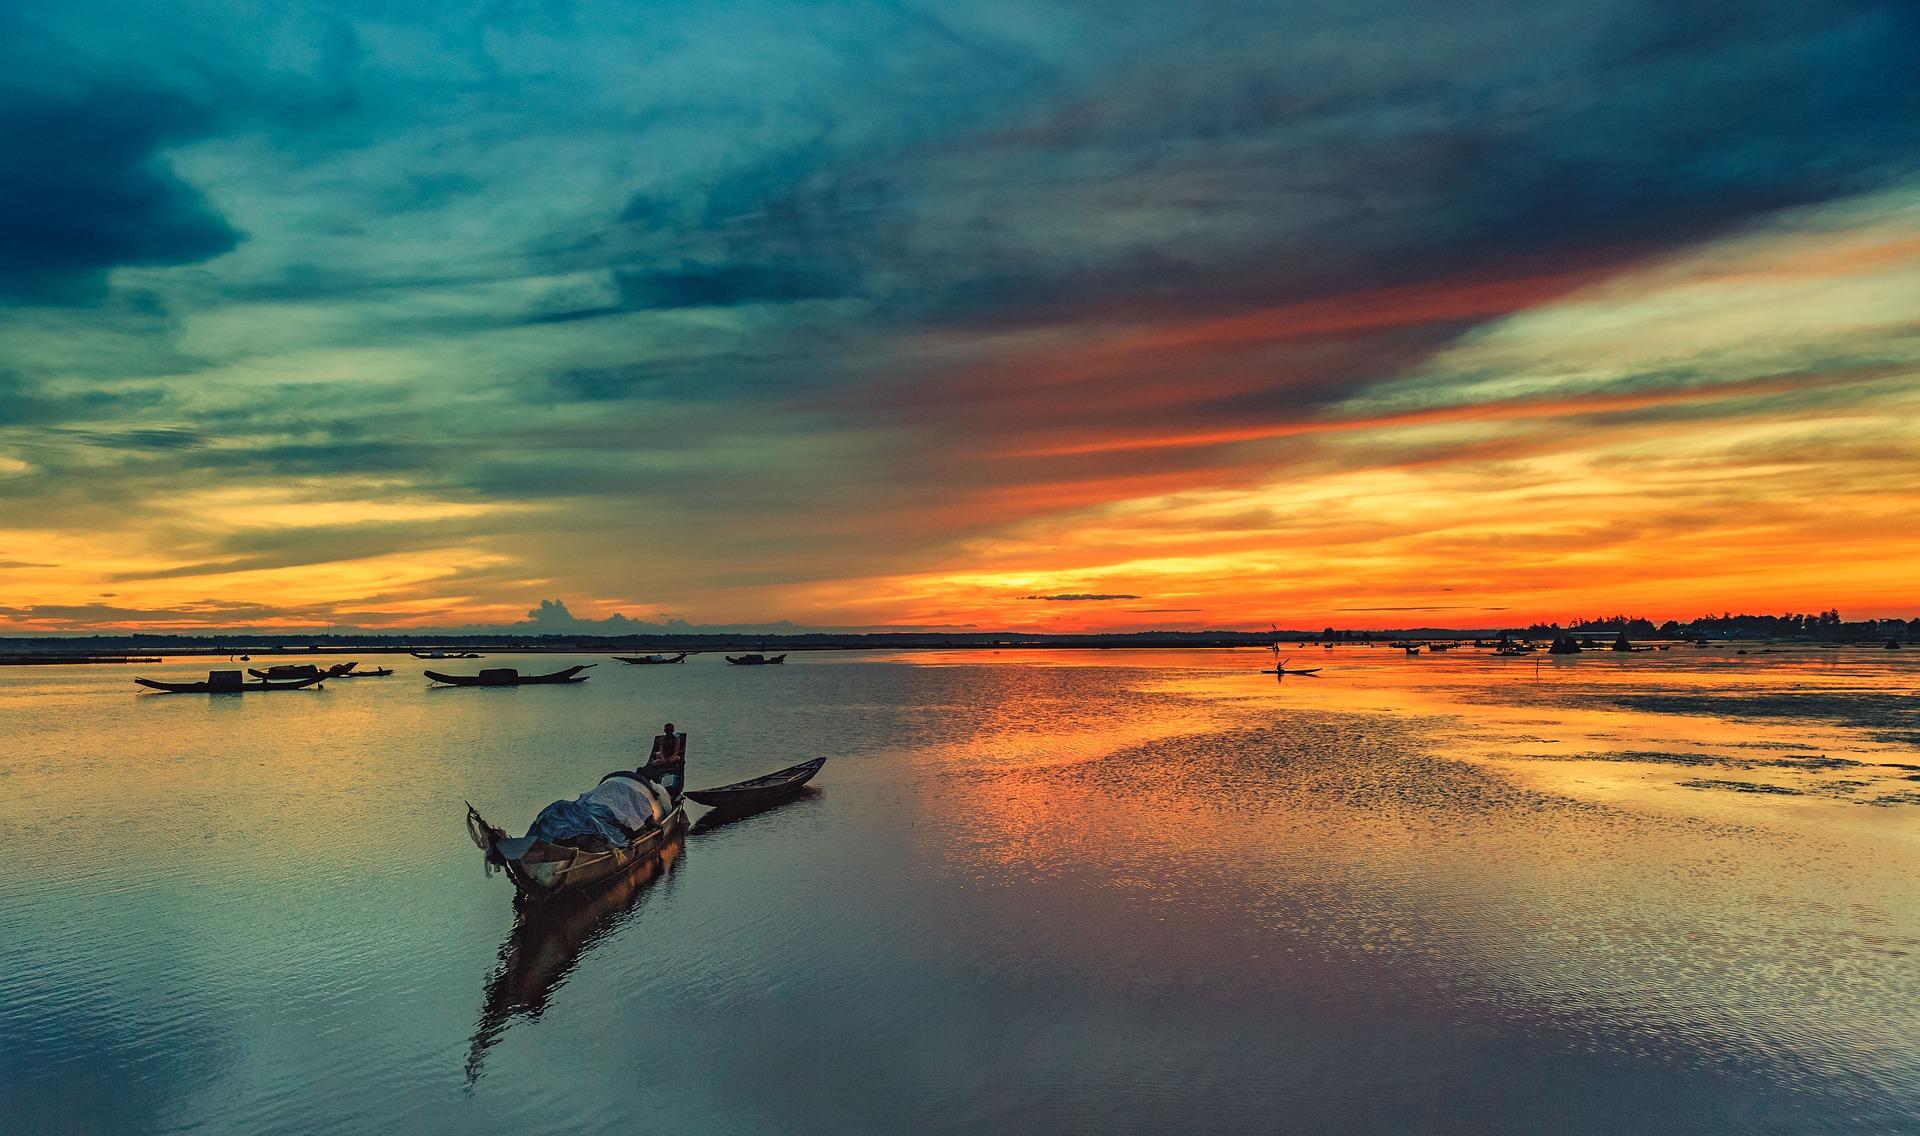 Hue, fishing boat in lake at sunset, Vietnam